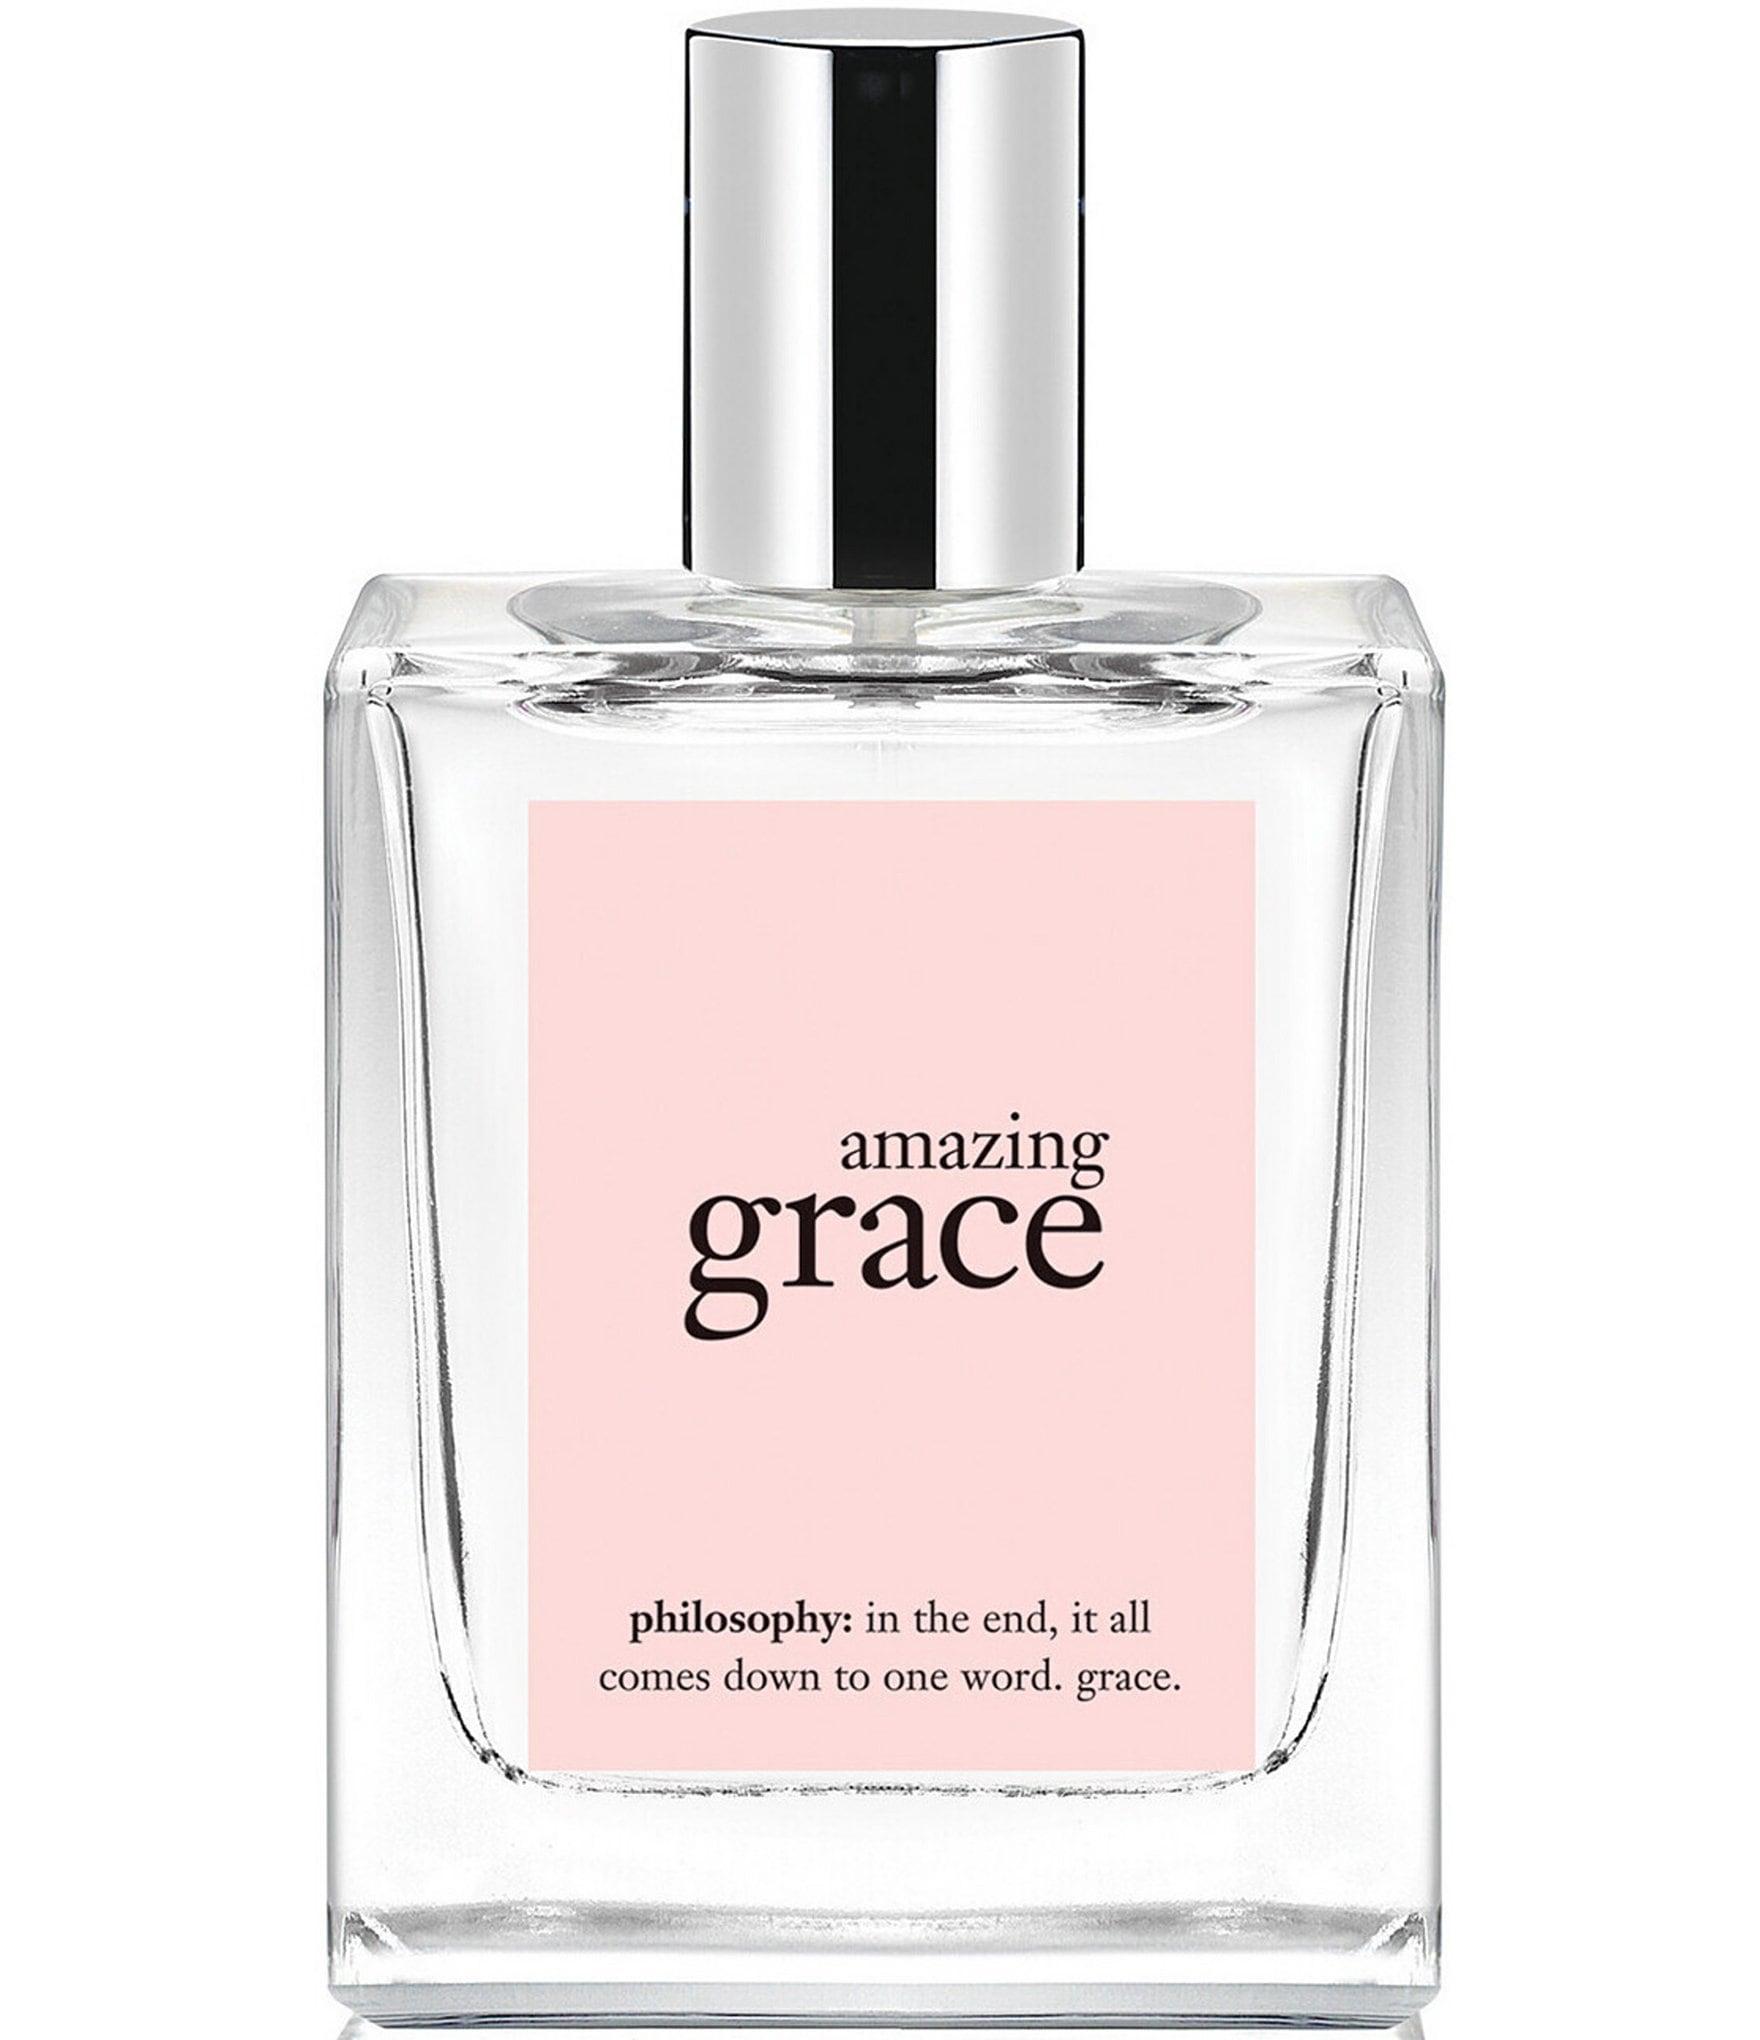 philosophy amazing grace spray fragrance dillards